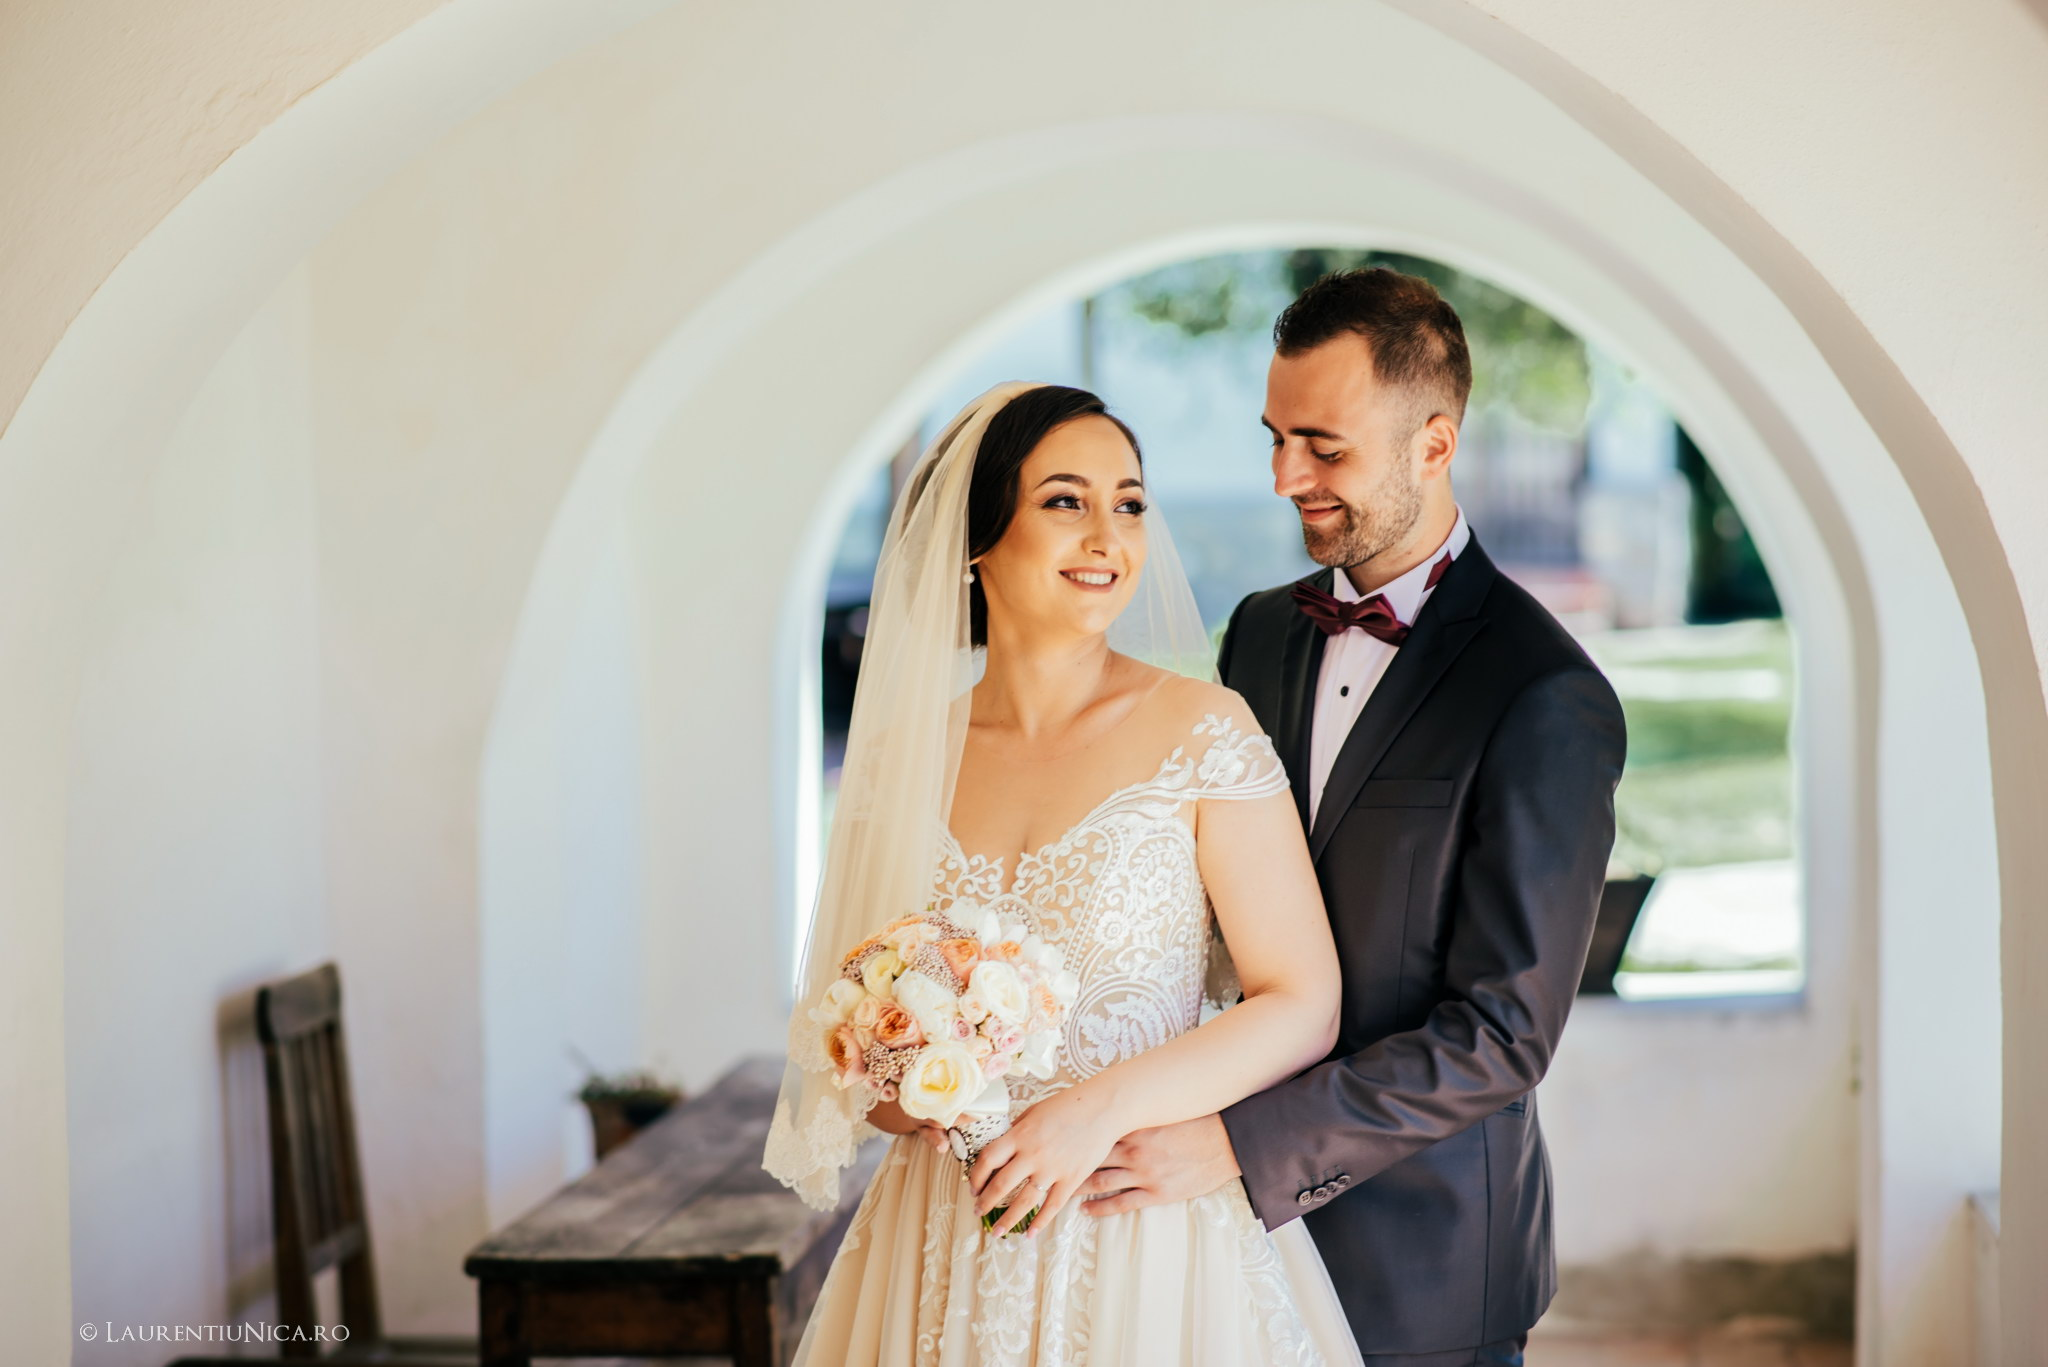 daiana si madalin fotograf nunta laurentiu nica targu jiu gorj 16 - Daiana & Madalin | Fotografii nunta | Targu-Jiu | Gorj